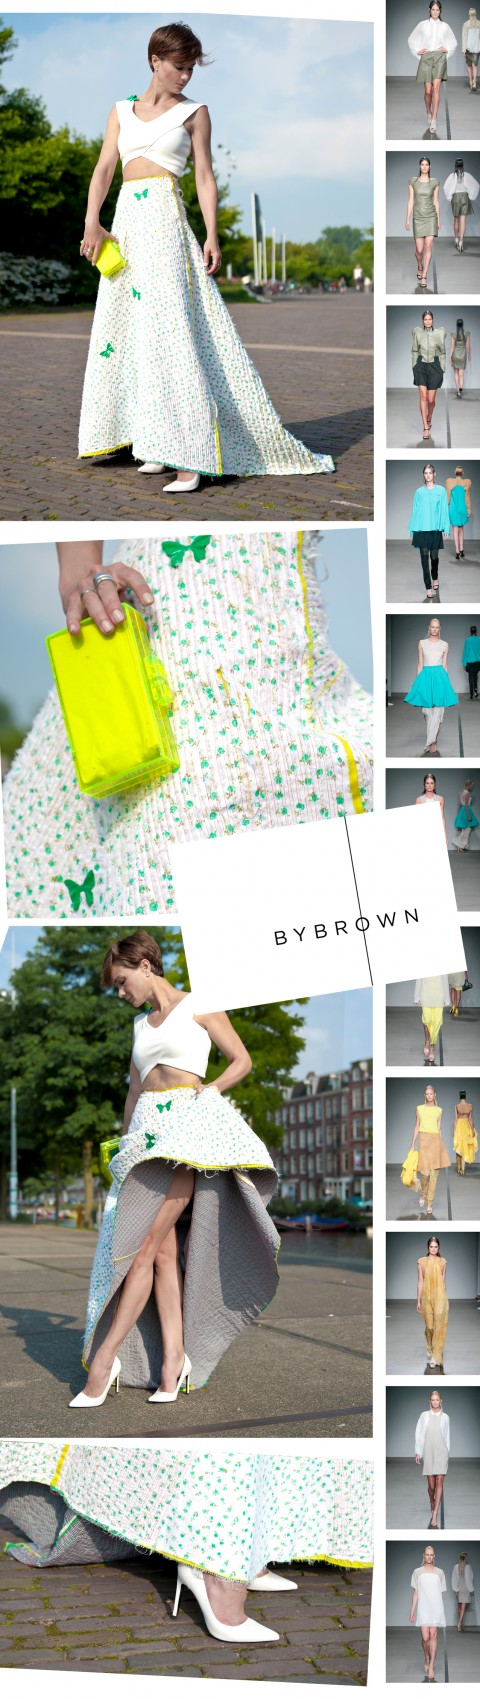 Fashion Week Fierce  |  BYBROWN